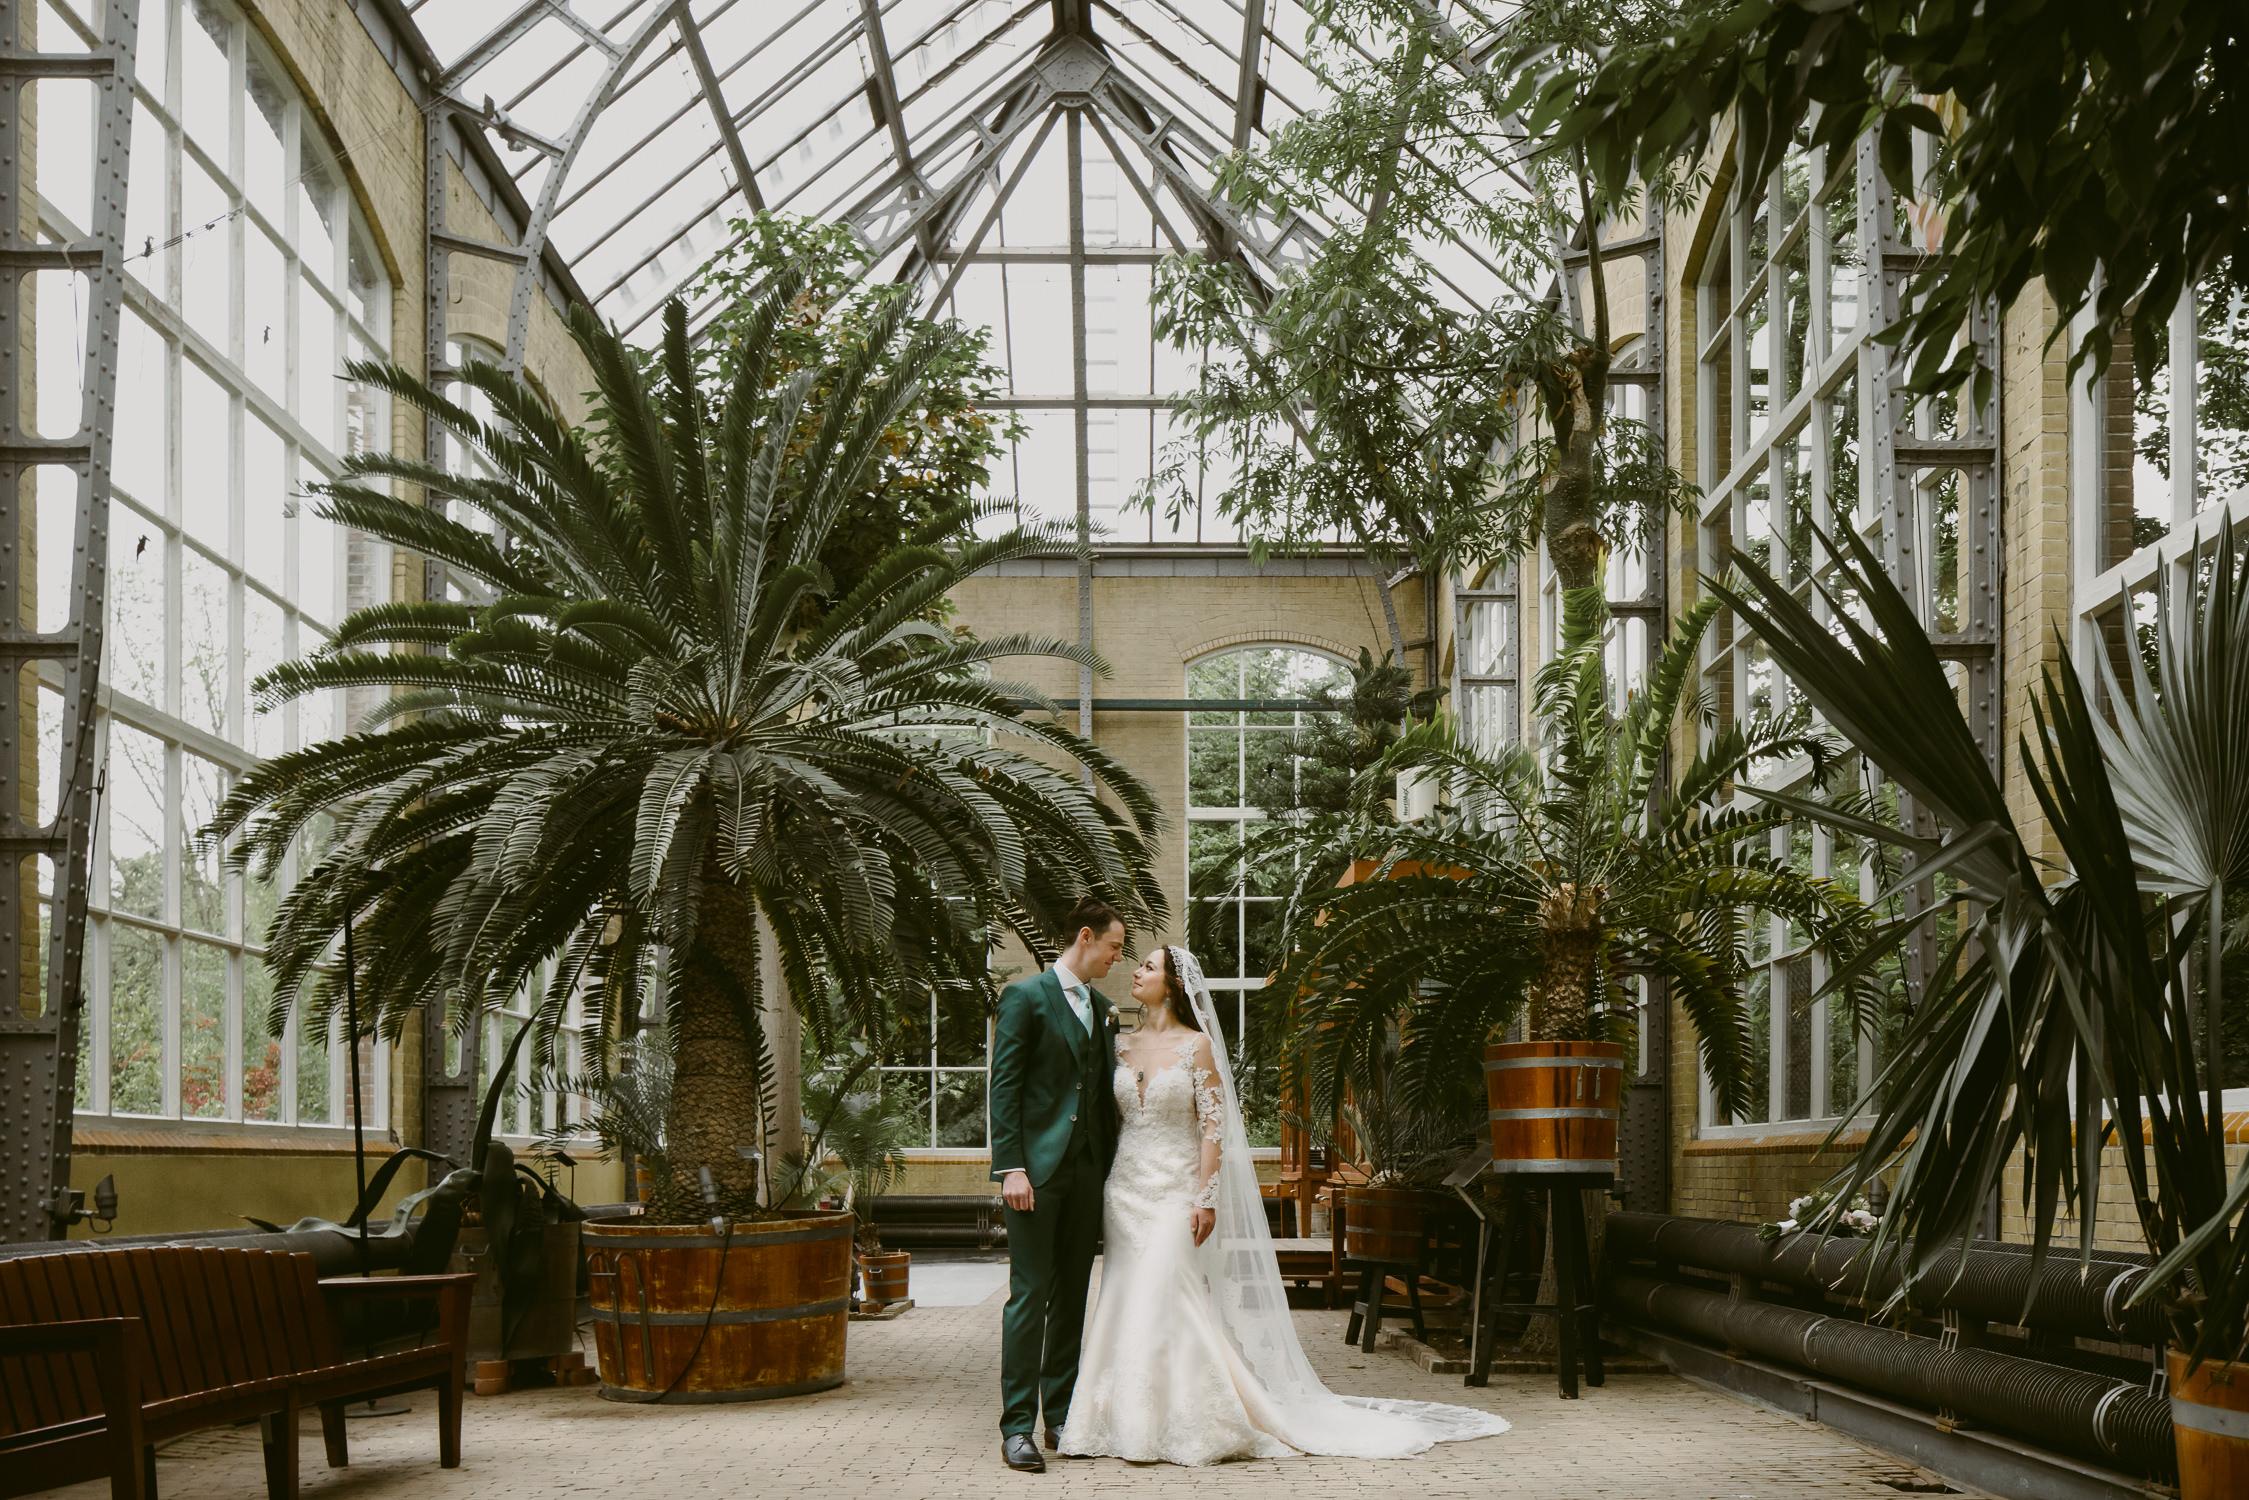 bruidsfotografie amsterdam palm huis hortus botanicus